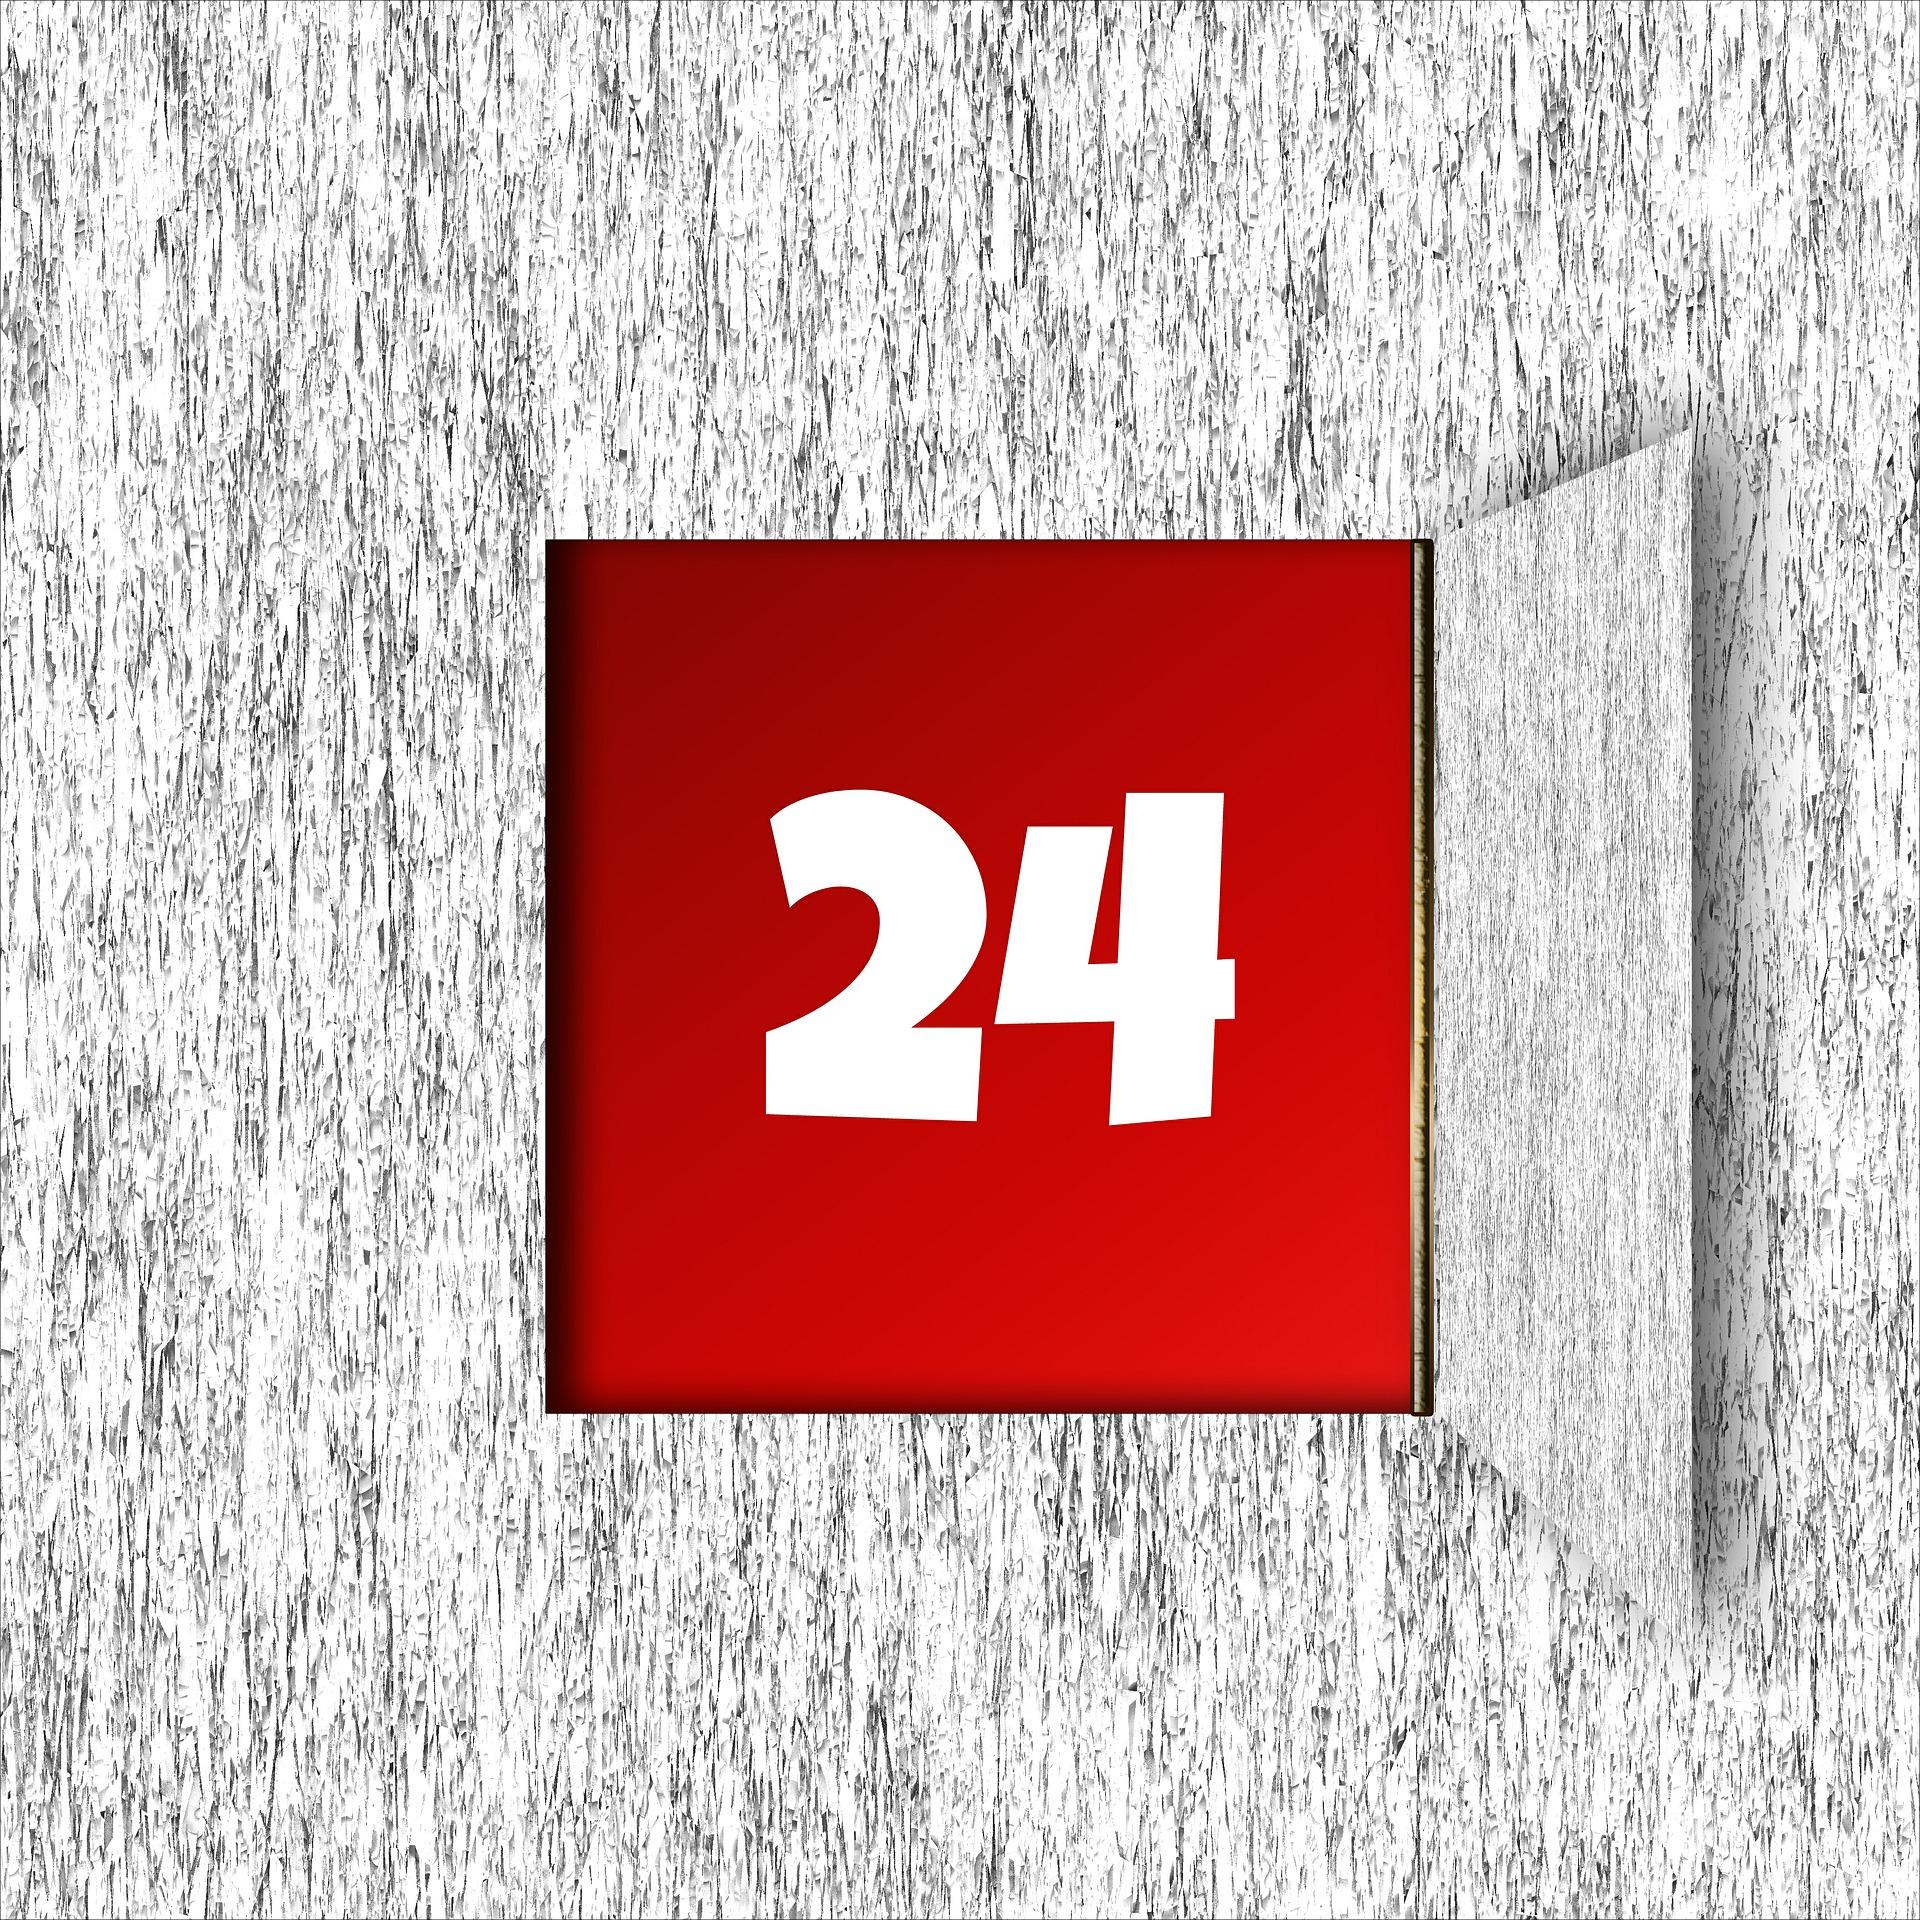 advent-calendar-560637_1920.jpg